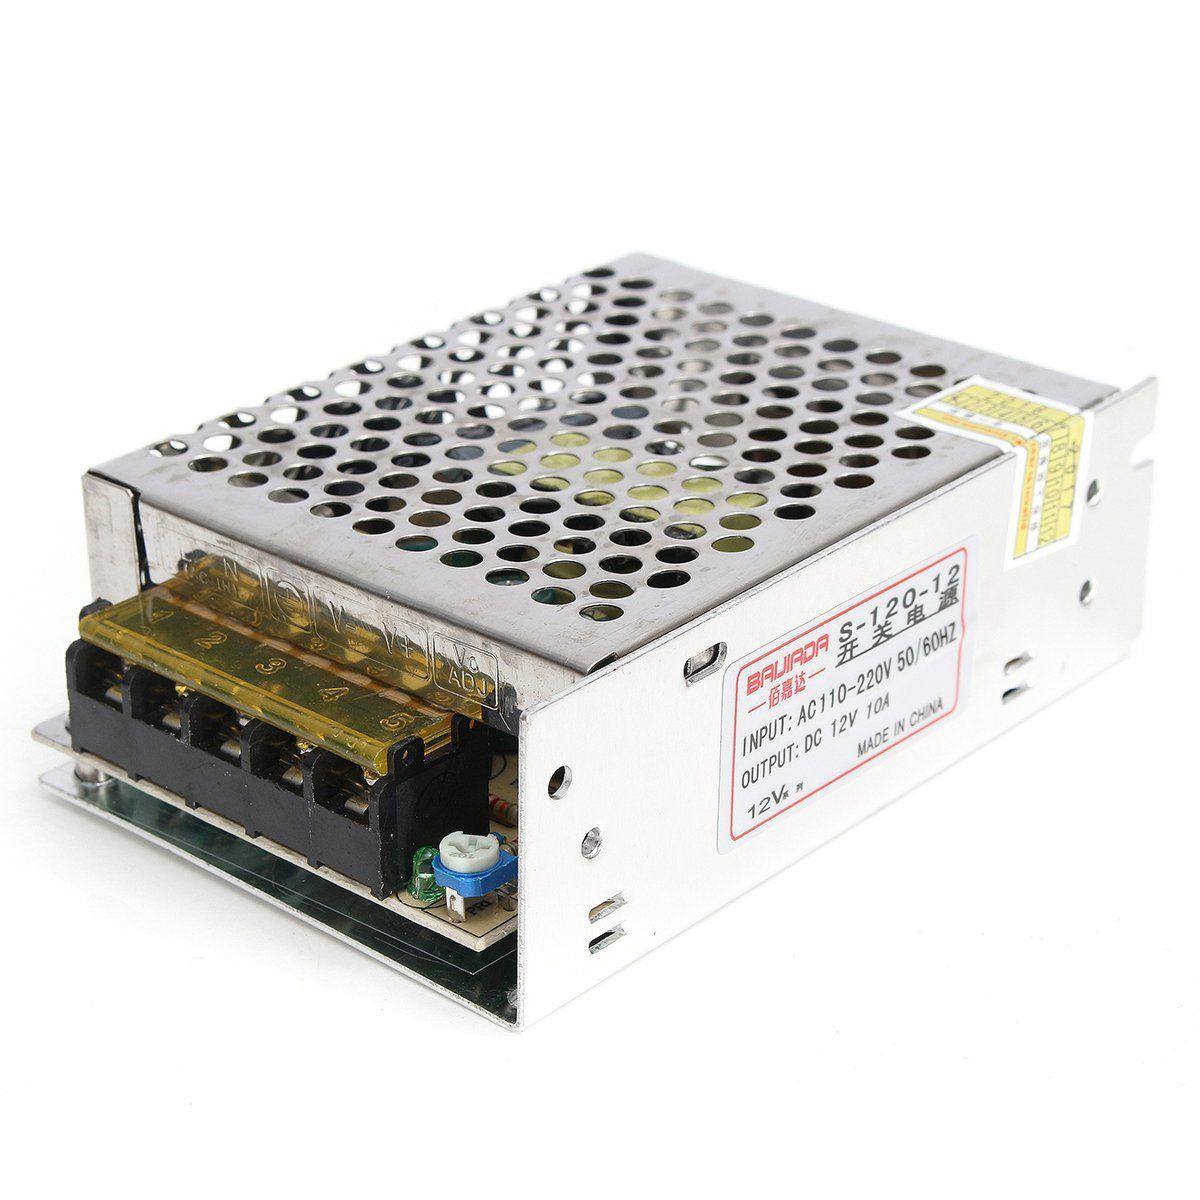 AC110220V To DC 12V 10A 120W Power Supply Lighting